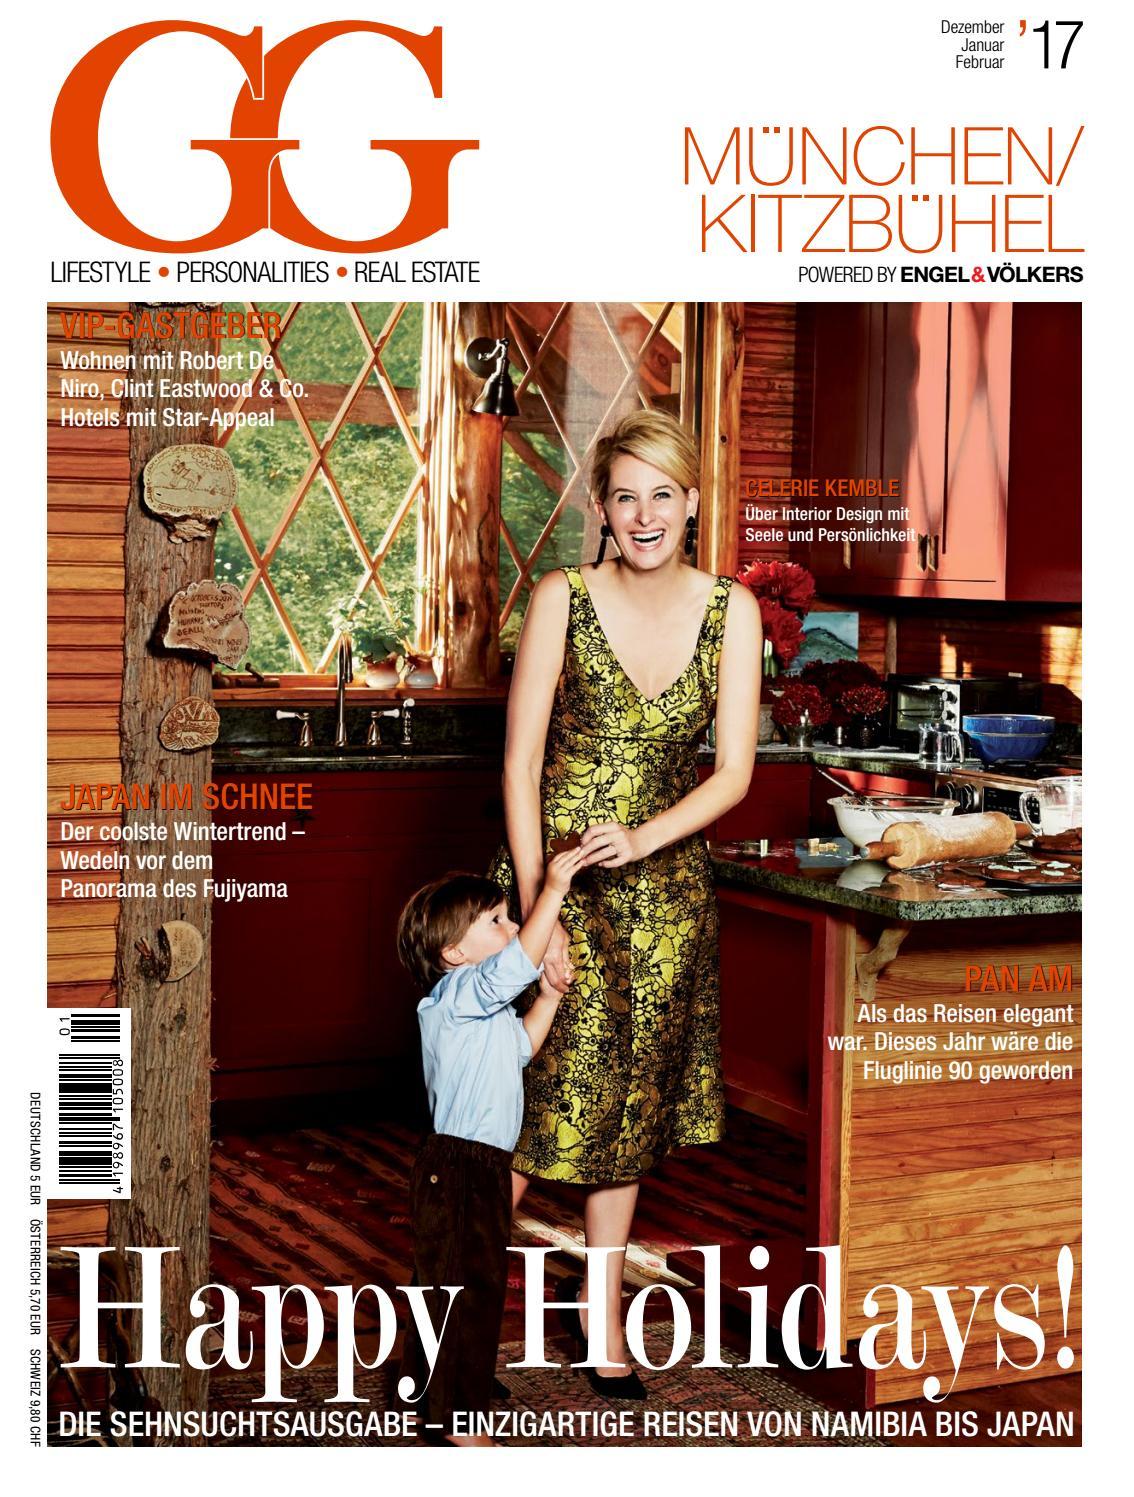 Gg magazine 01/17 münchen/kitzbühel by gg magazine   issuu